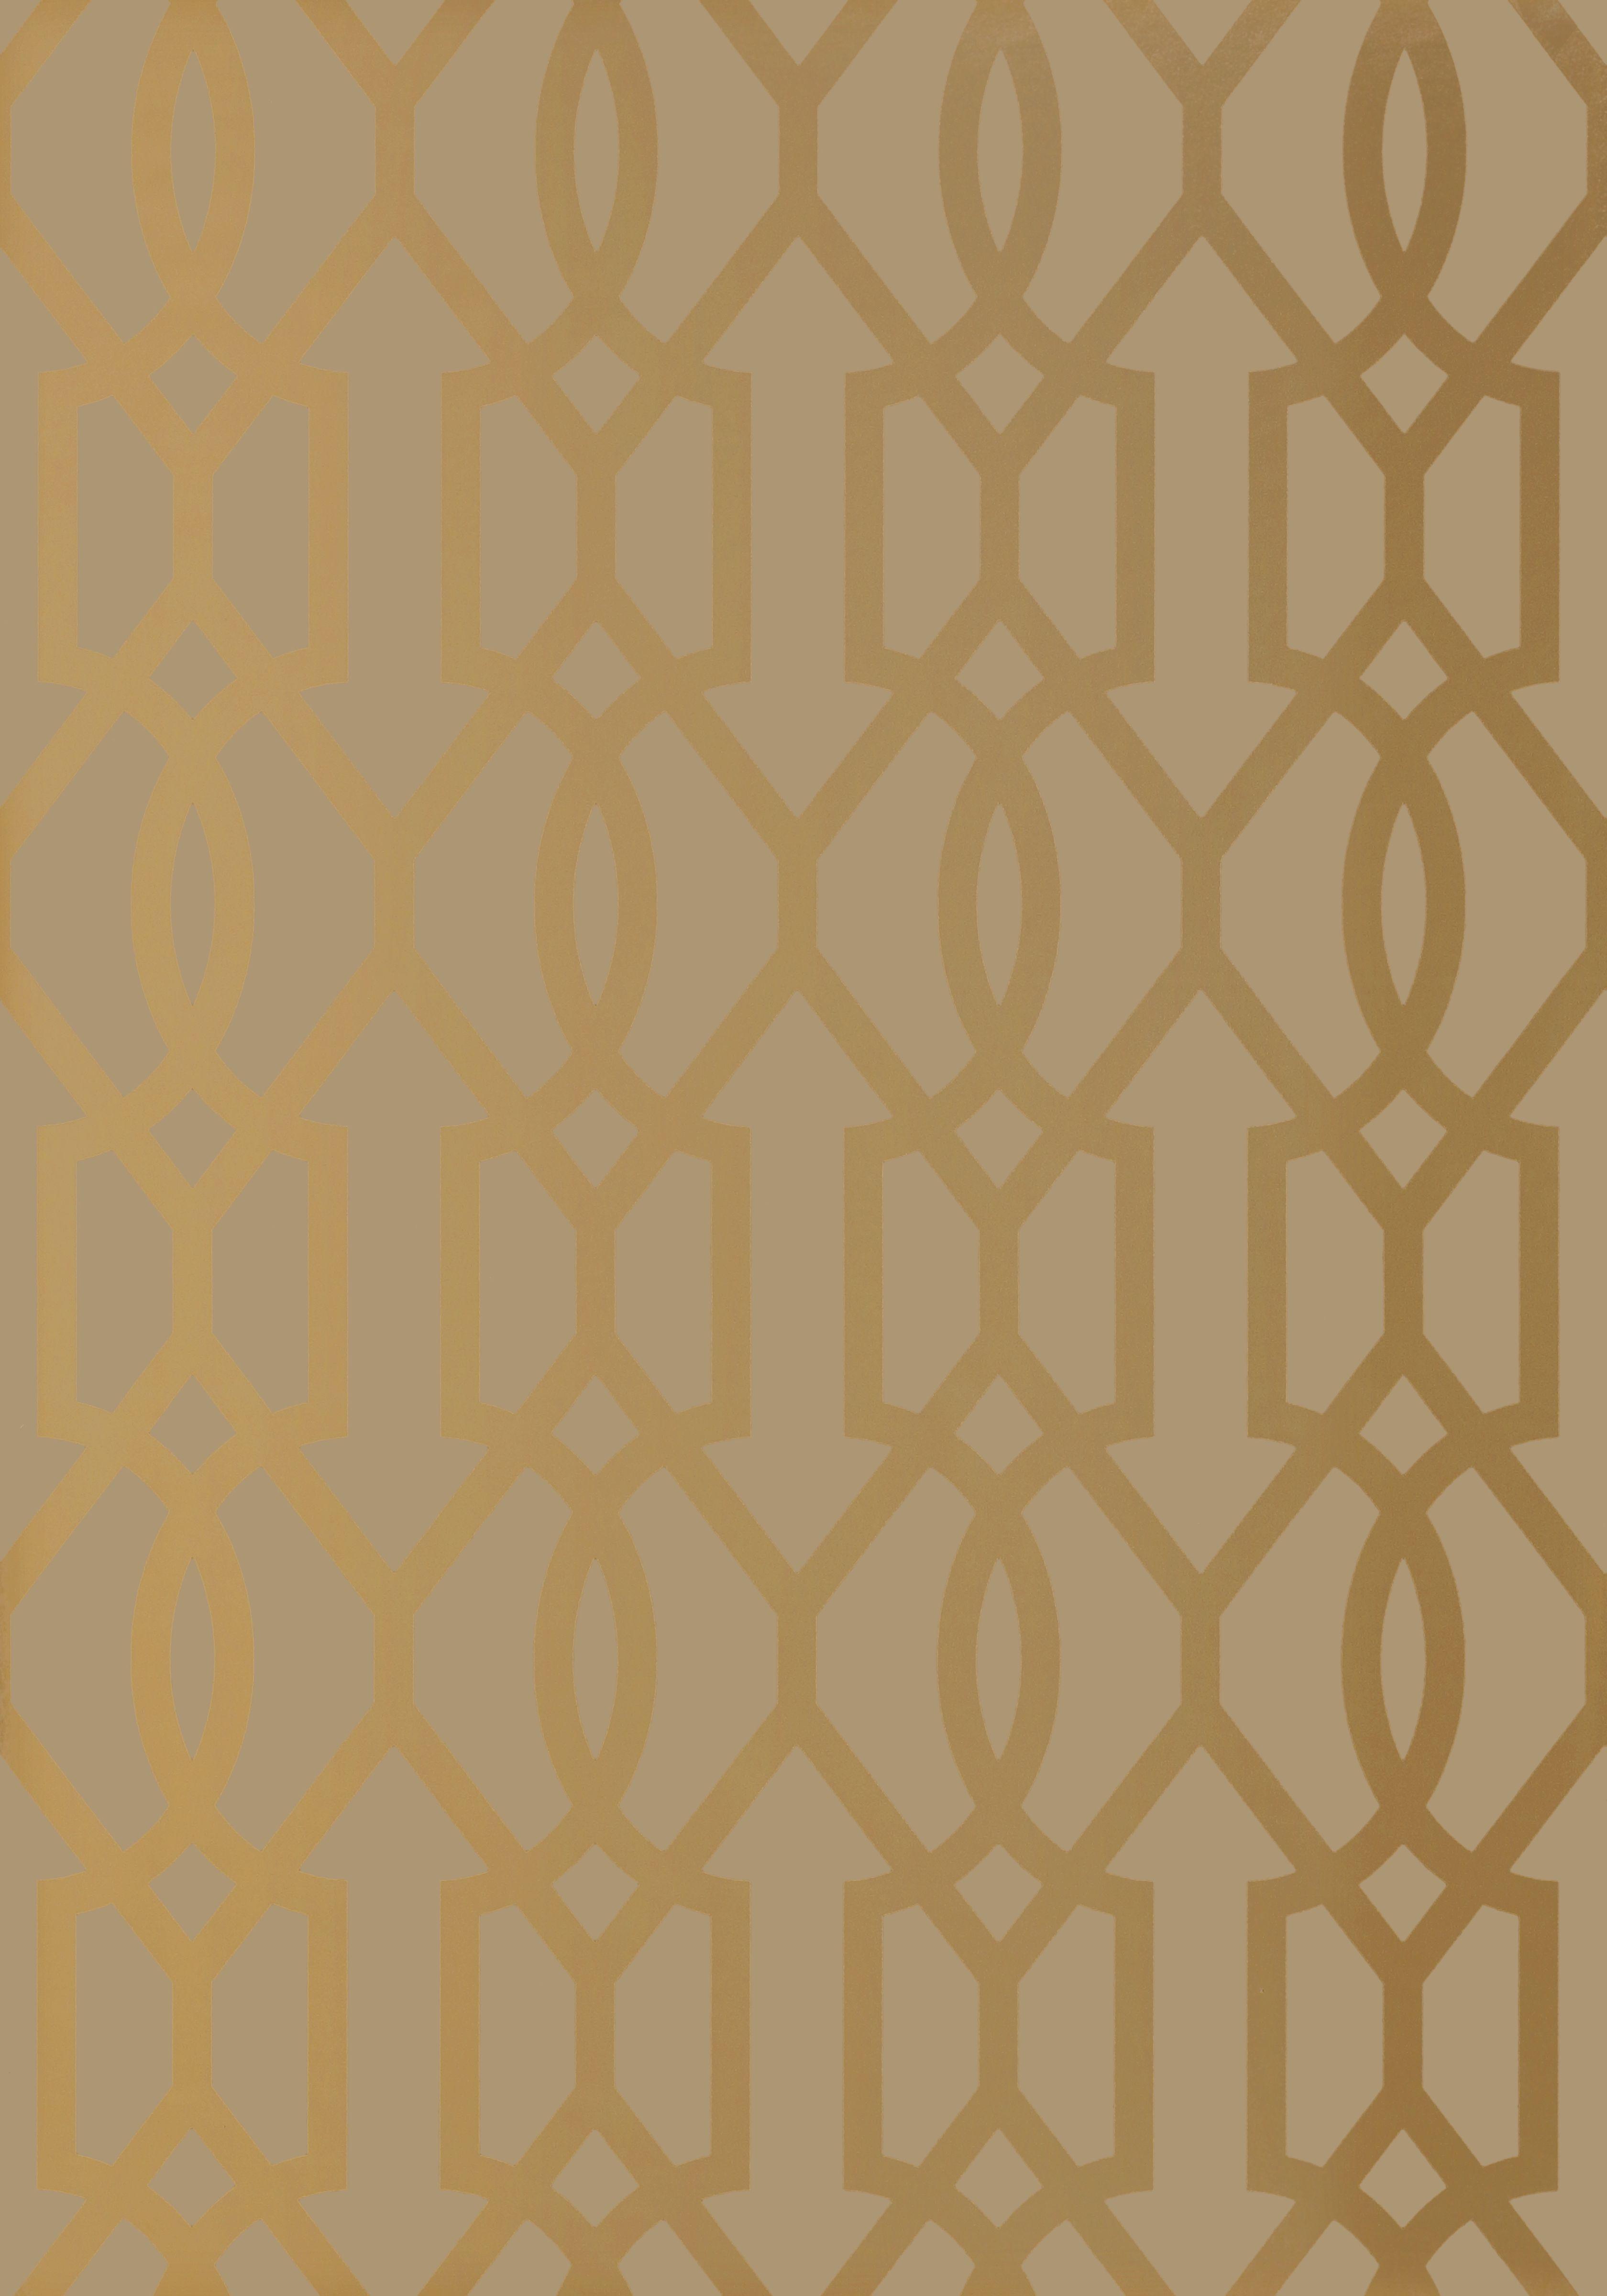 Downing Gate Thibaut wallpaper Metallic Gold on Bark